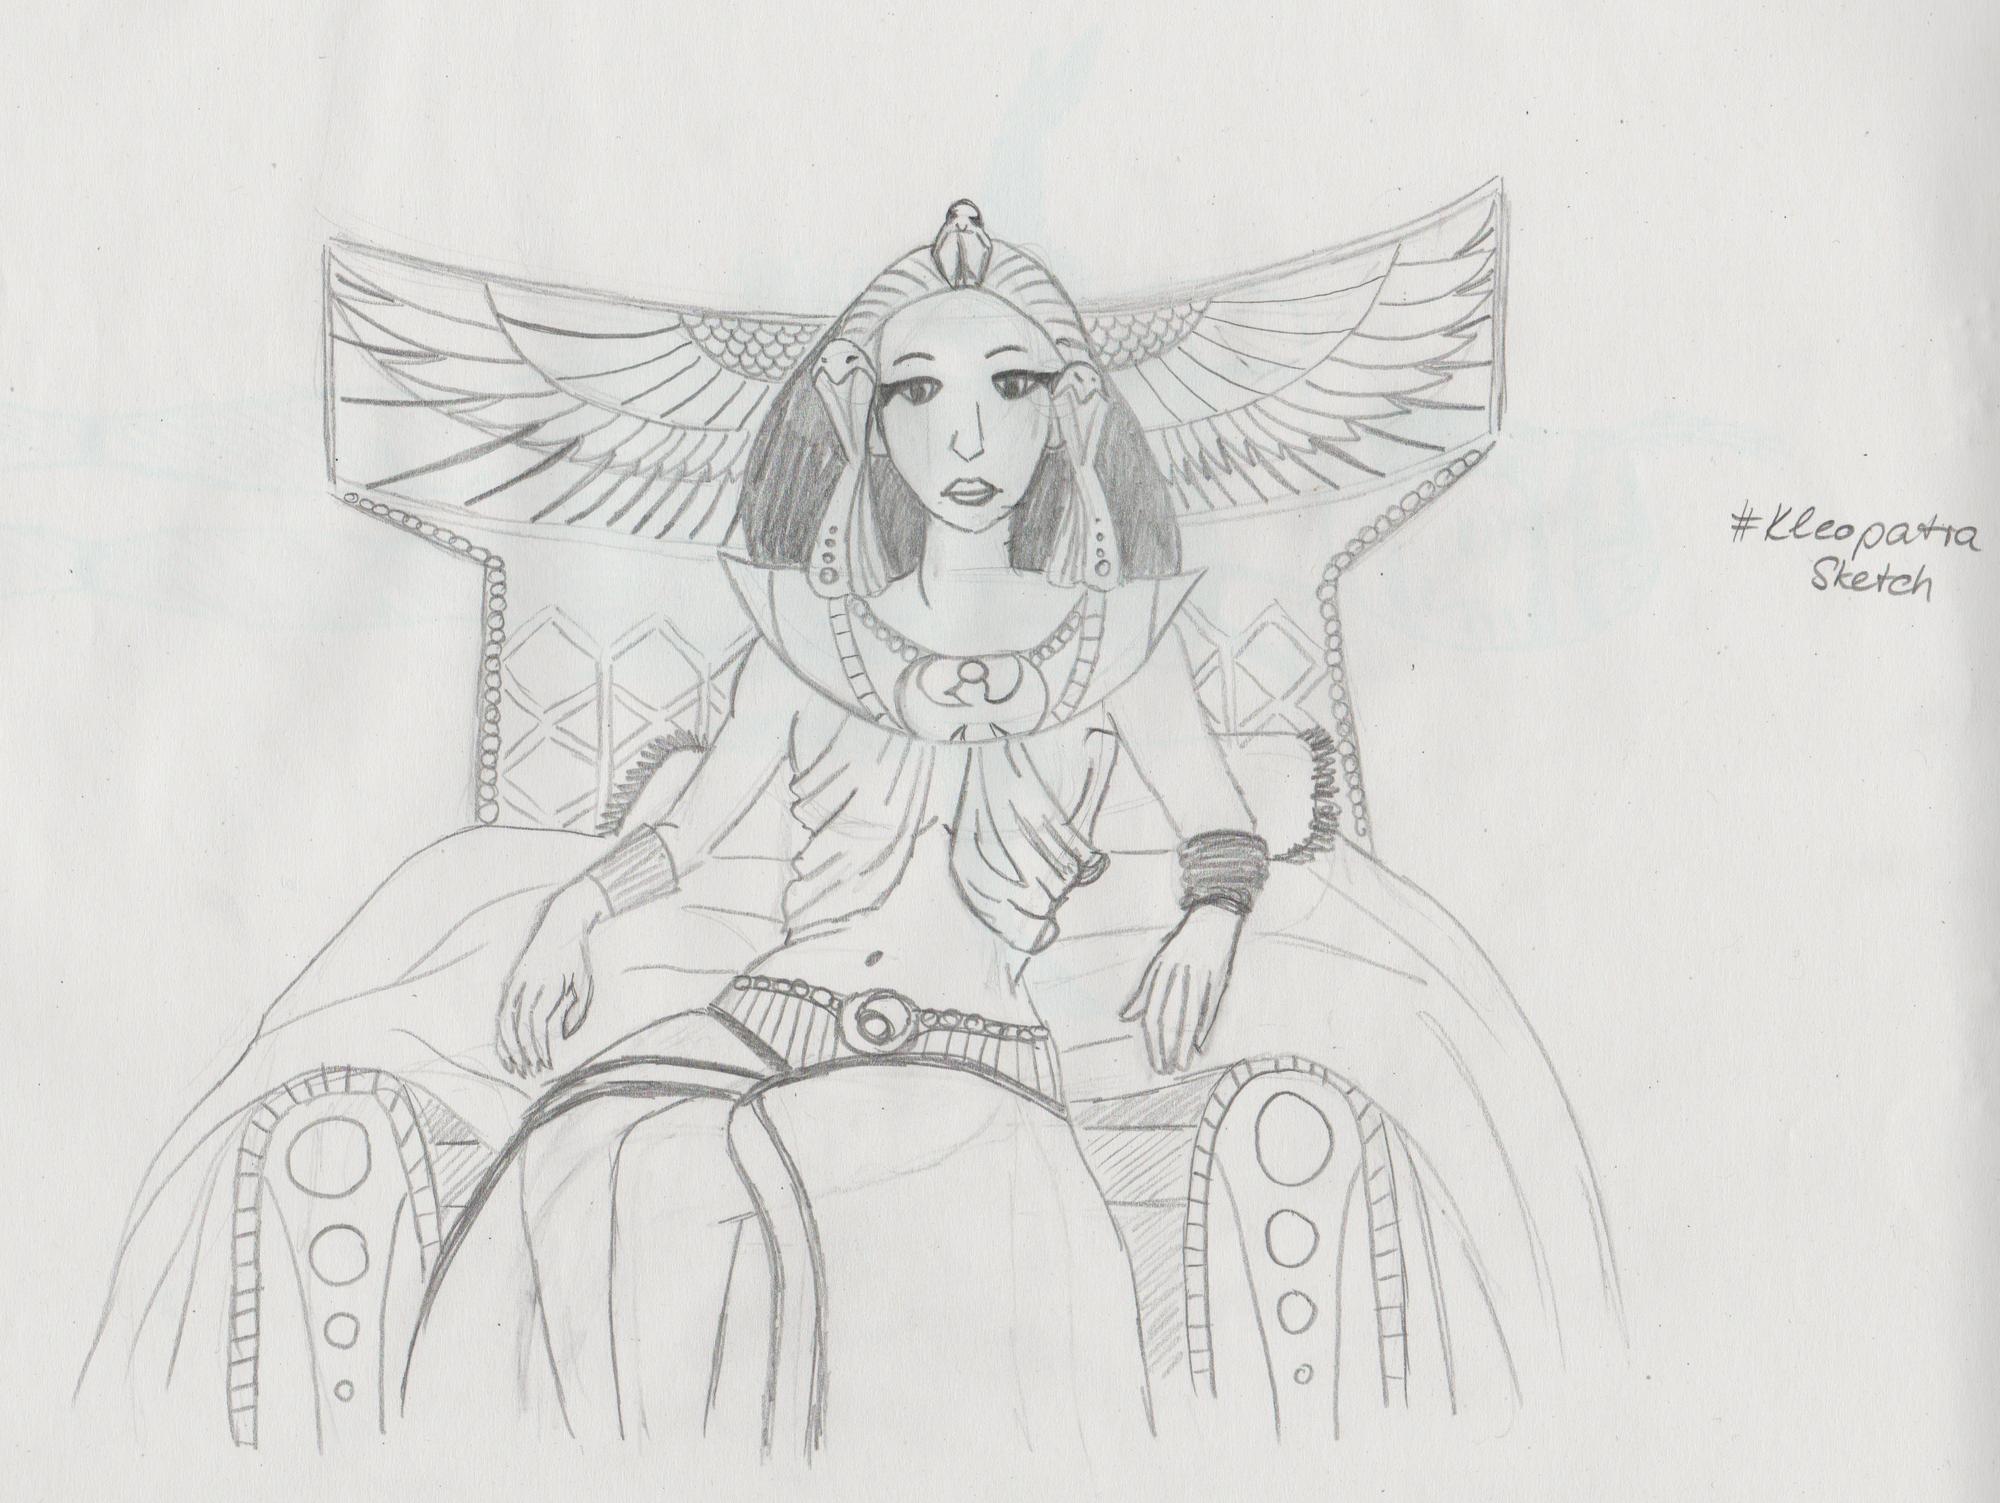 Kleopatra